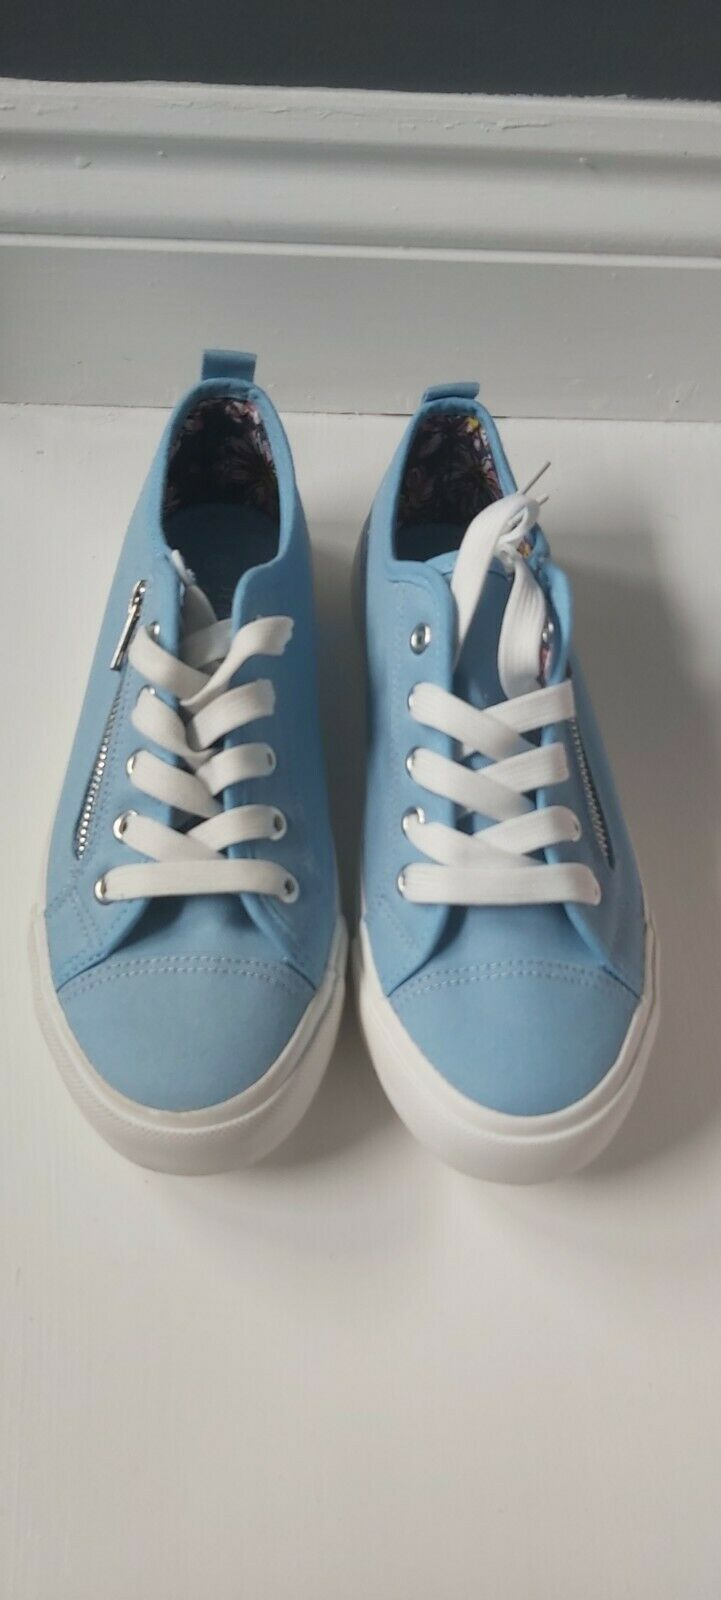 Ladies light blue trainers size 5